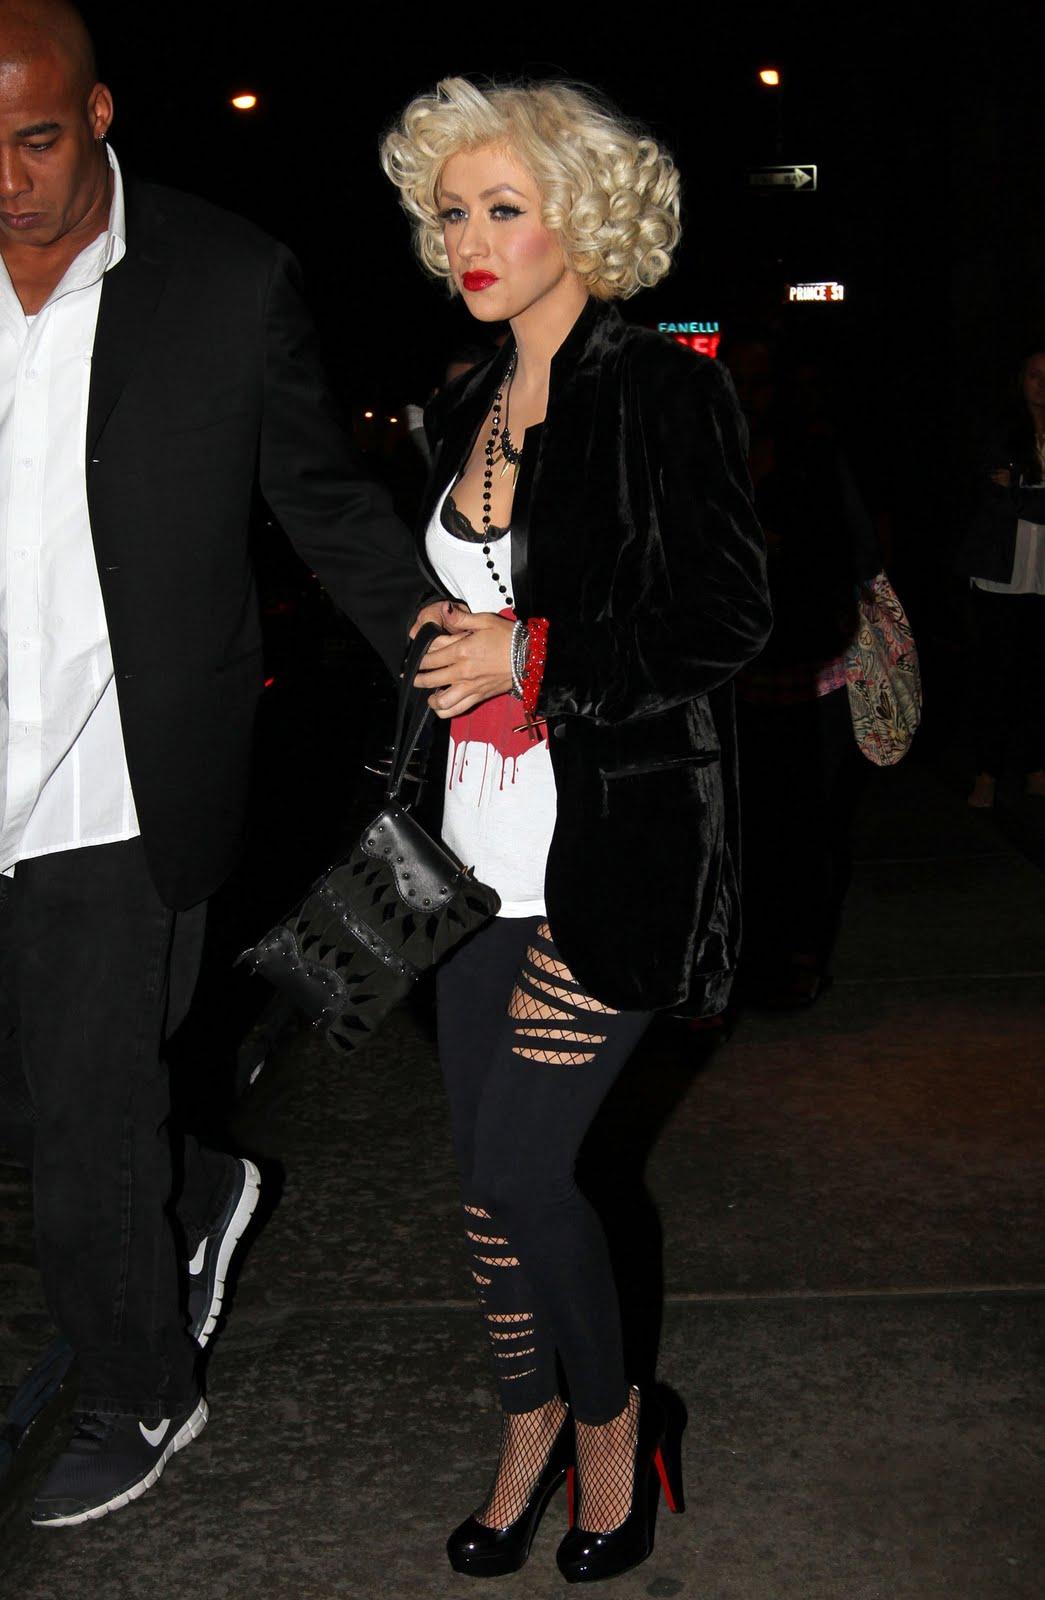 http://4.bp.blogspot.com/_0mLqBqGwhxY/S-dA9UYZwBI/AAAAAAAAAPI/1dPCagS1_0Q/s1600/christina+aguillera+leggings+and+heels.jpg